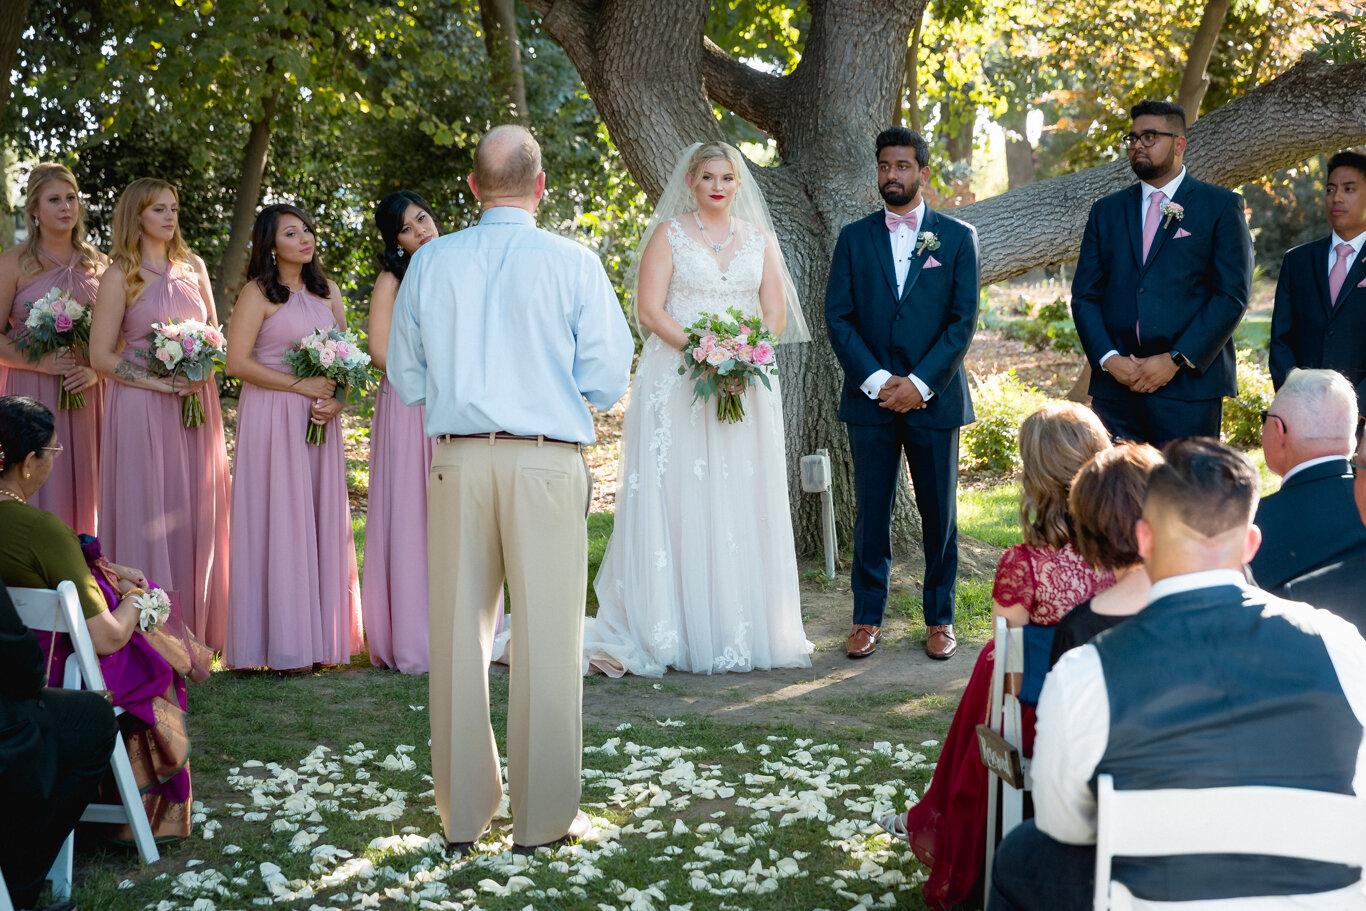 2019.08.24_Emily-Ashir-Wedding-at-the-Maples-5855.jpg